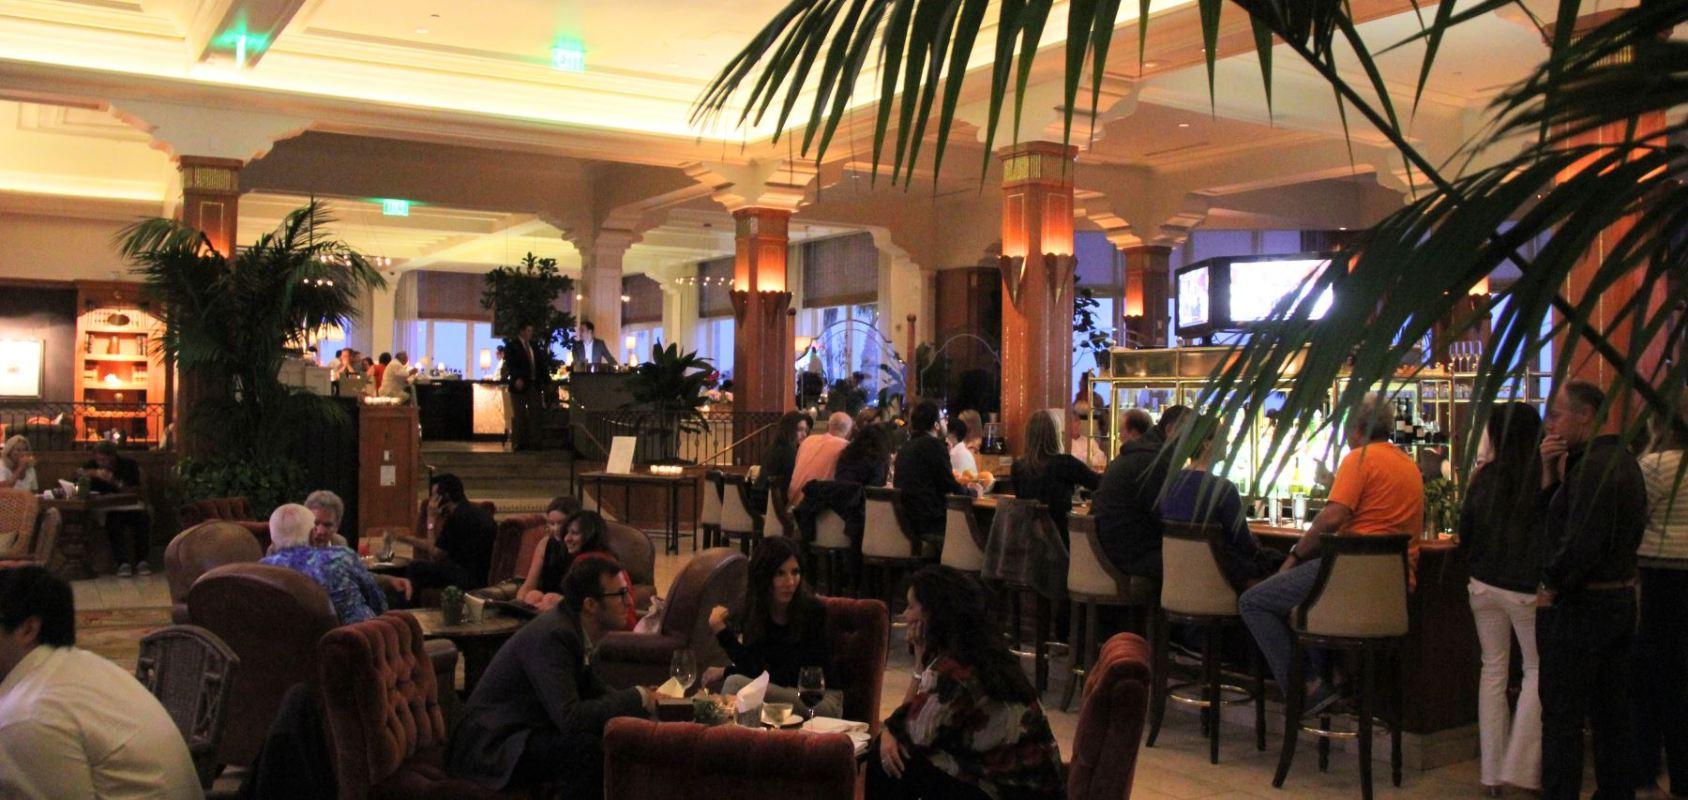 Casa Del Mar – A Classy Date Lounge by the Ocean